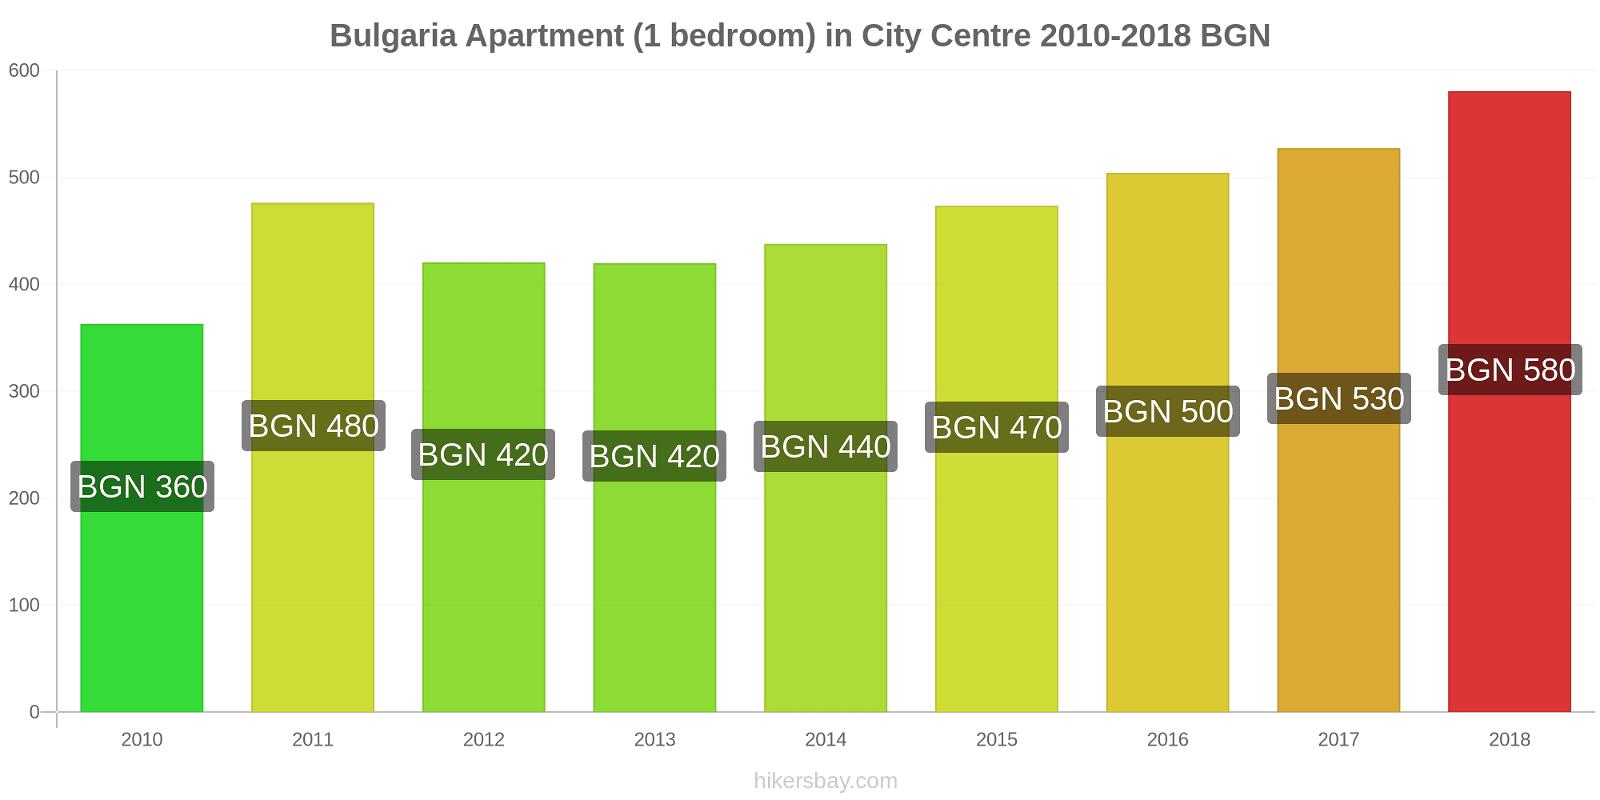 Bulgaria price changes Apartment (1 bedroom) in City Centre hikersbay.com